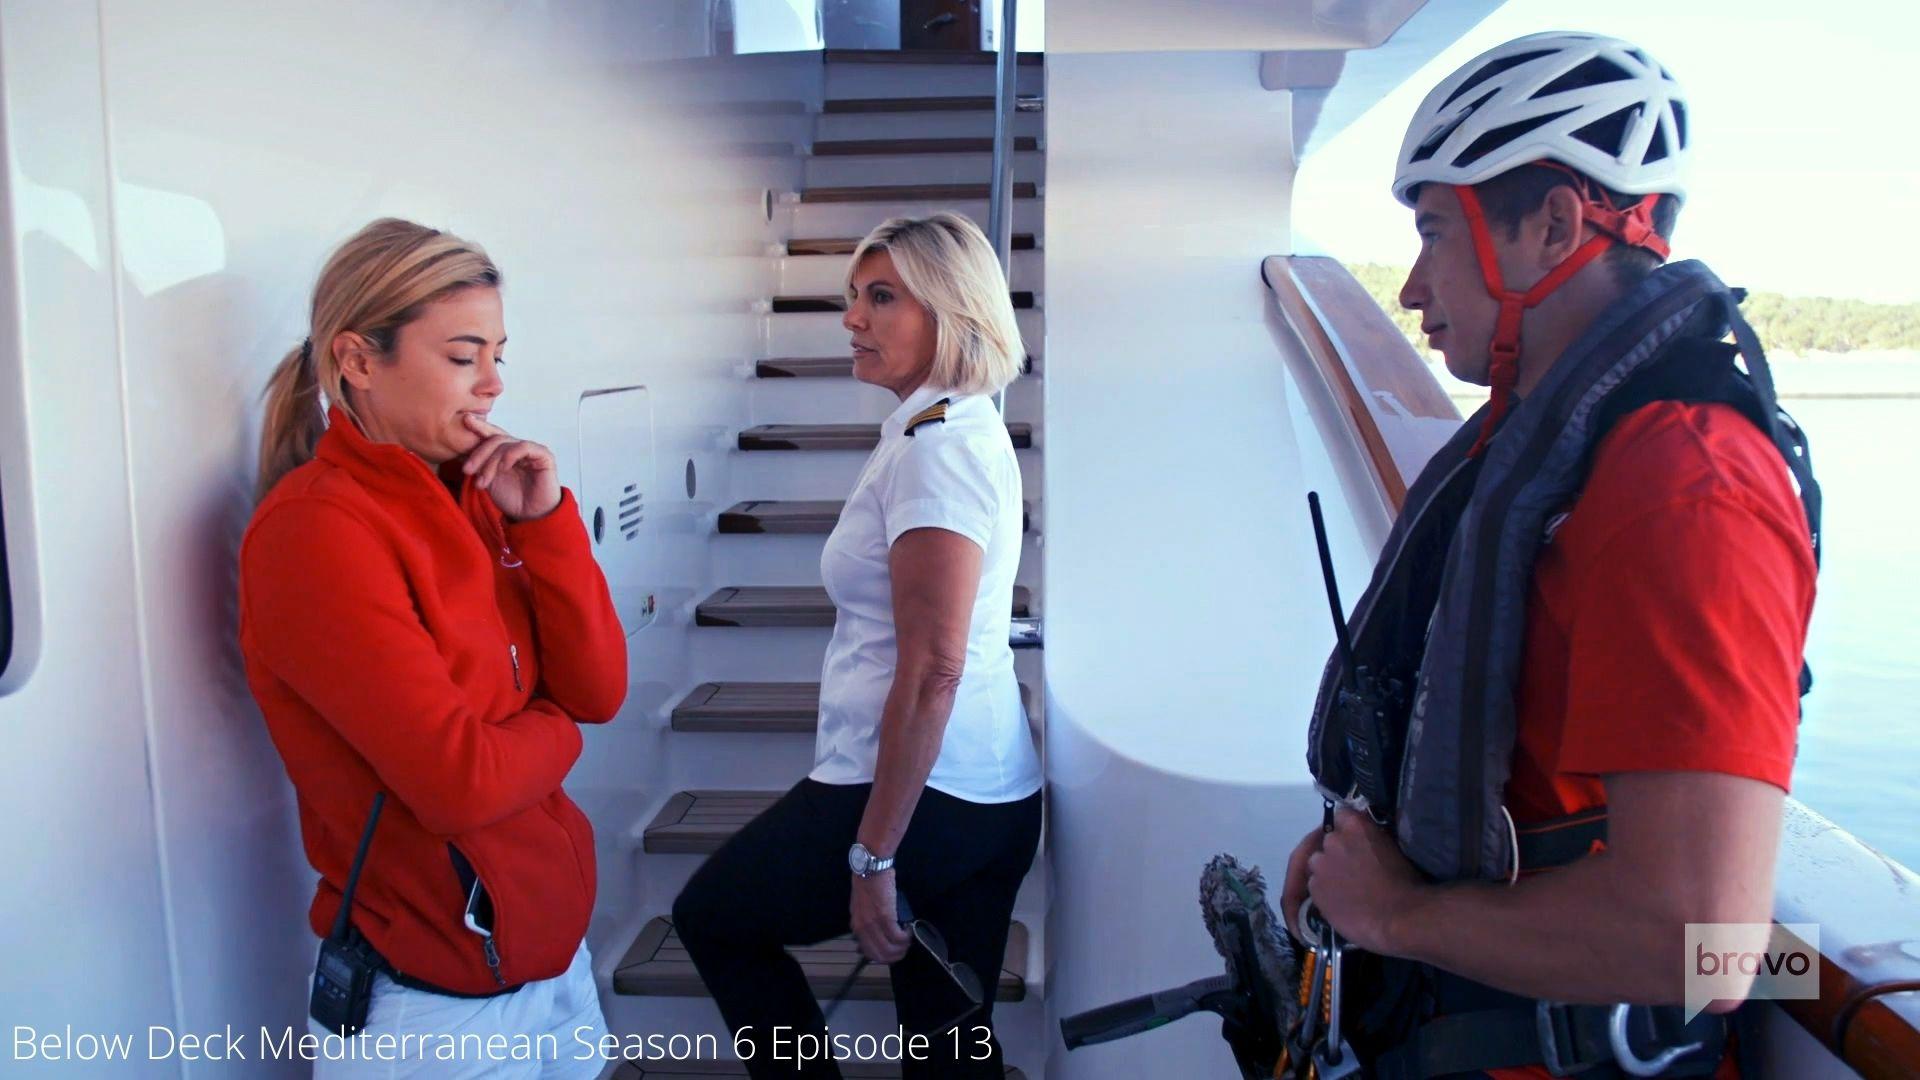 Below Deck Mediterranean Season 6 Episode 14